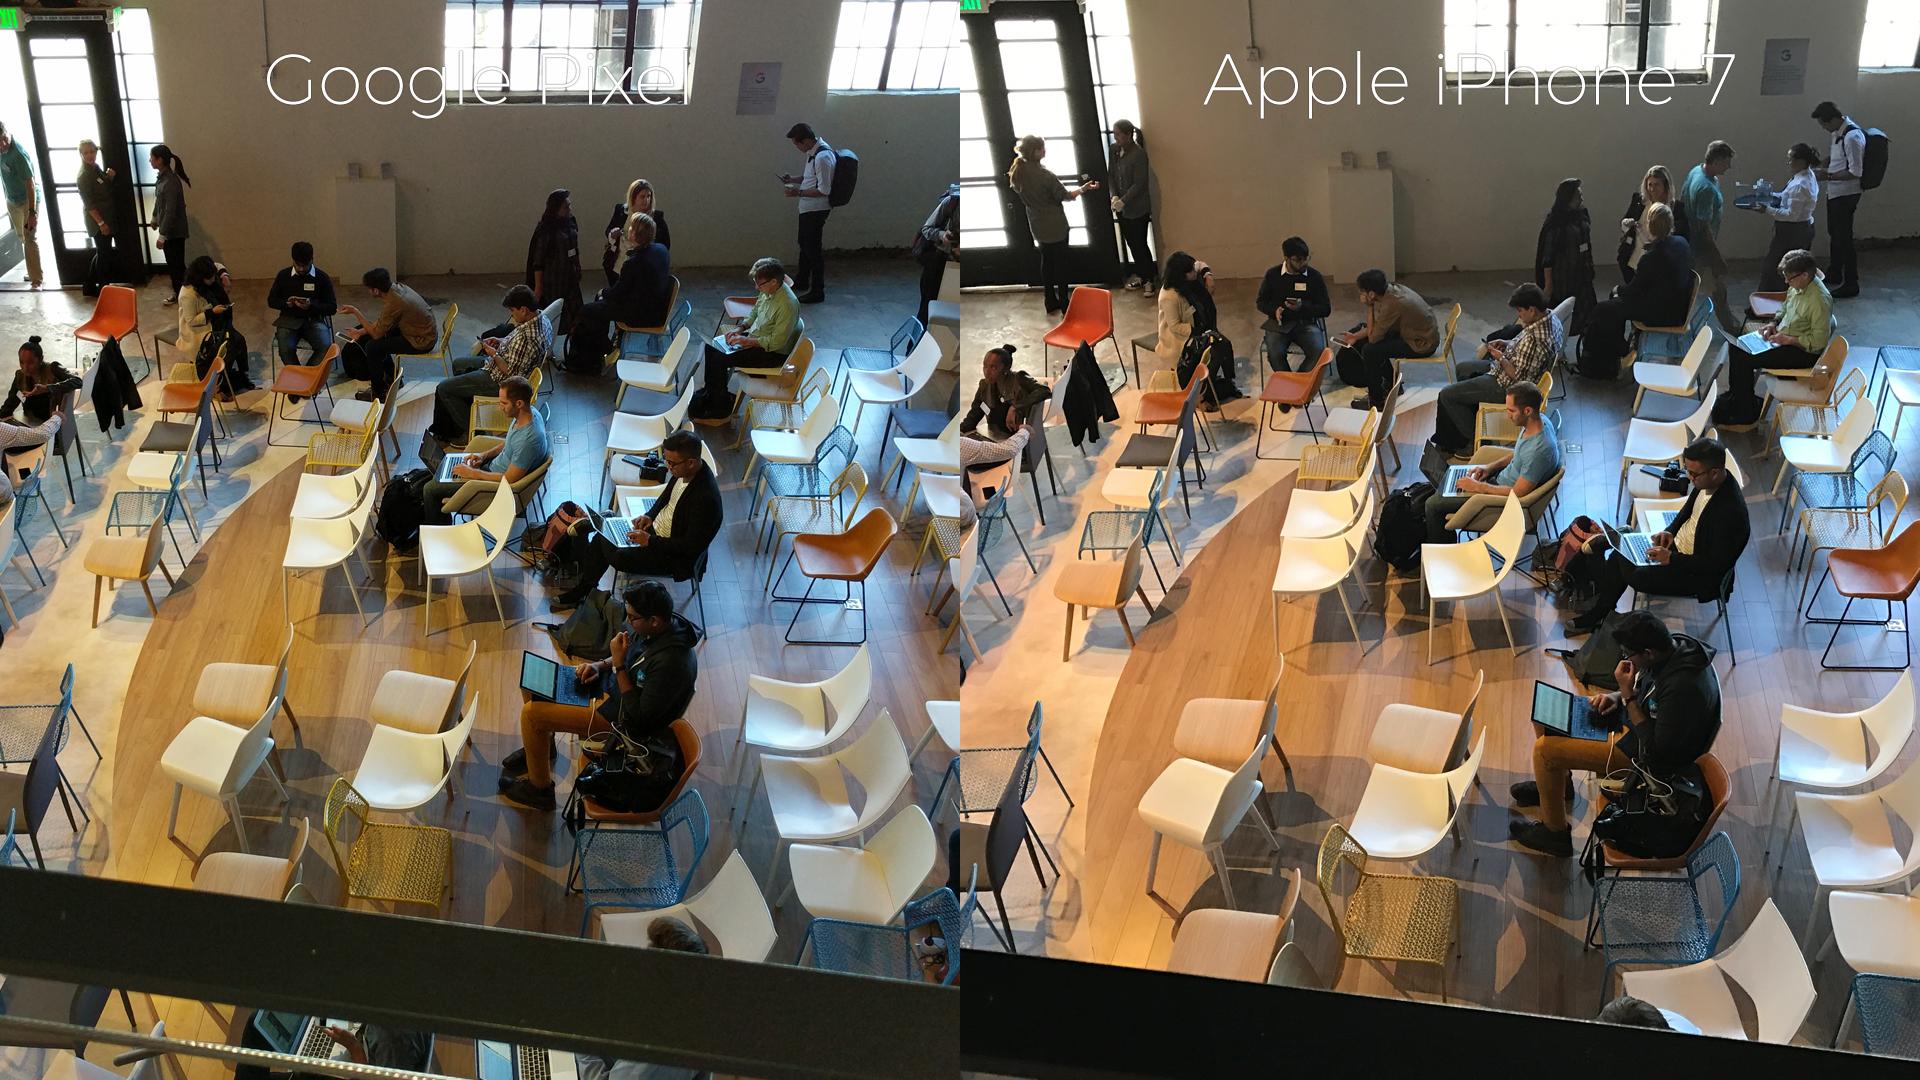 Google Pixel Vs Iphone 7 Camera Comparison Photos